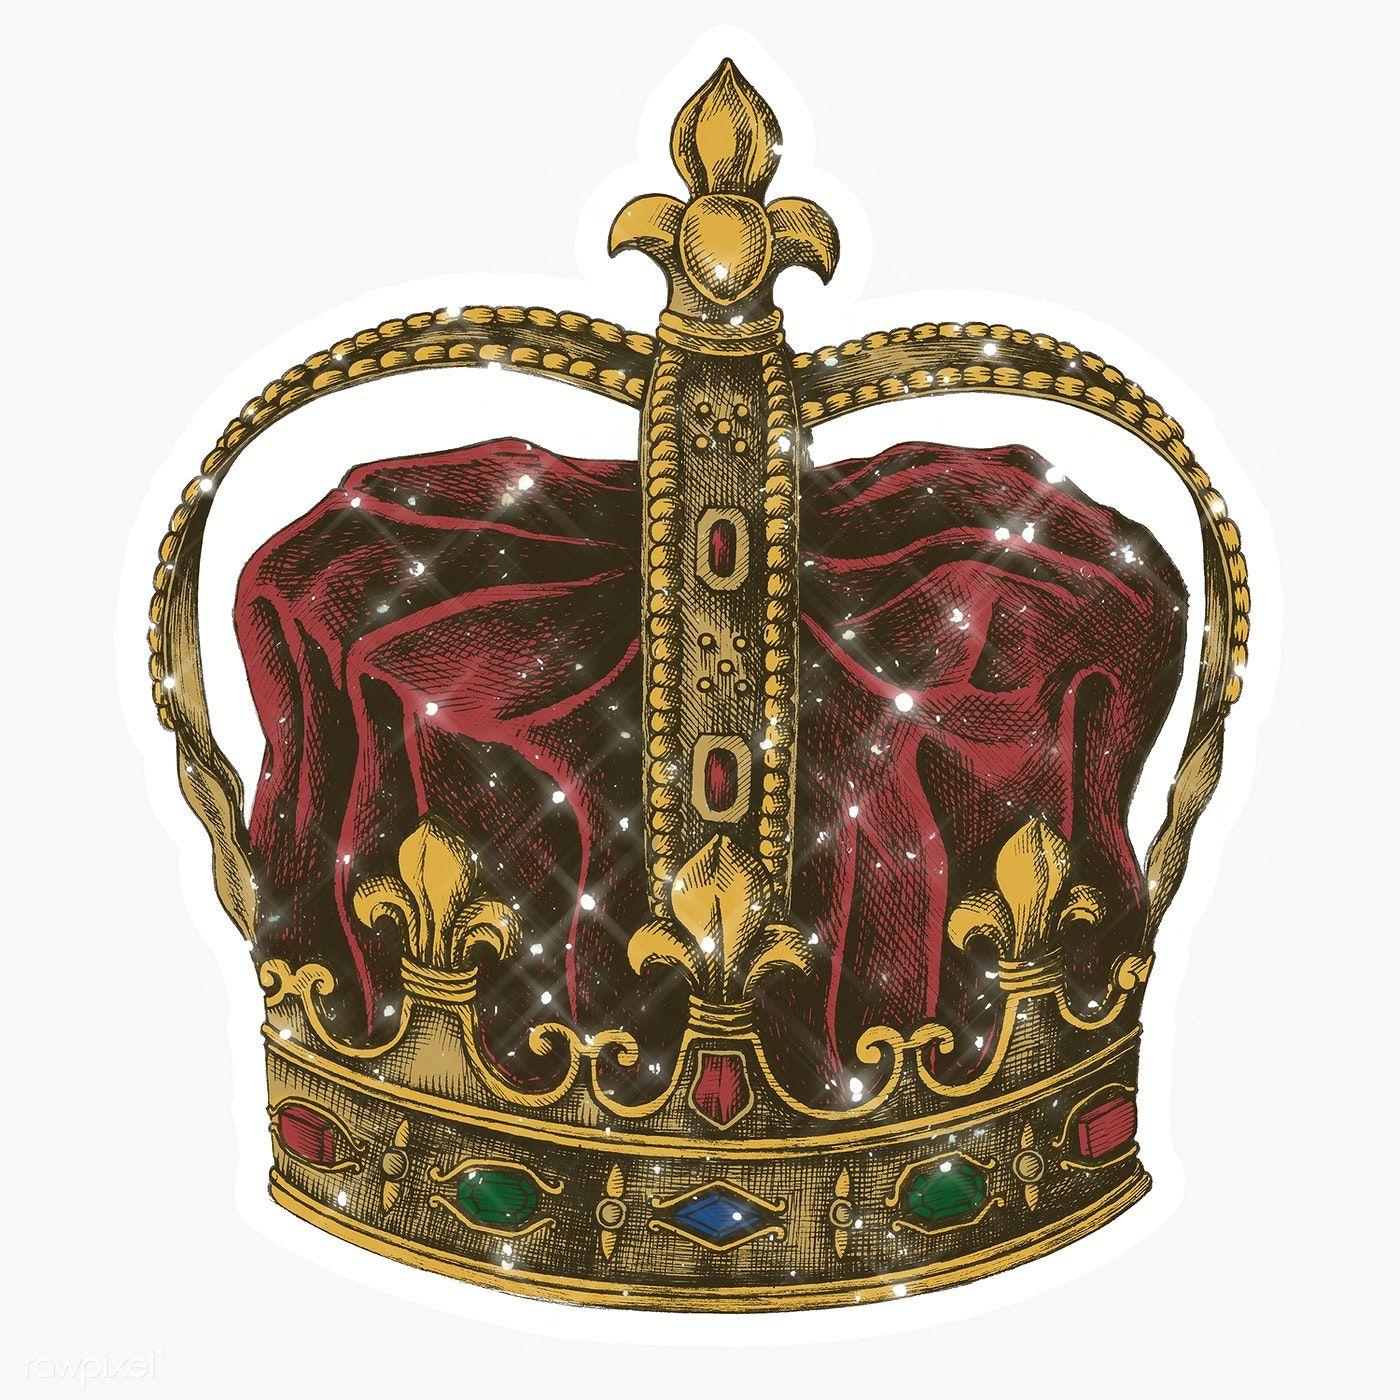 Sparkling Royal Crown Sticker With White Border Free Image By Rawpixel Com Manotang Crown Design Crown Royal Design Element